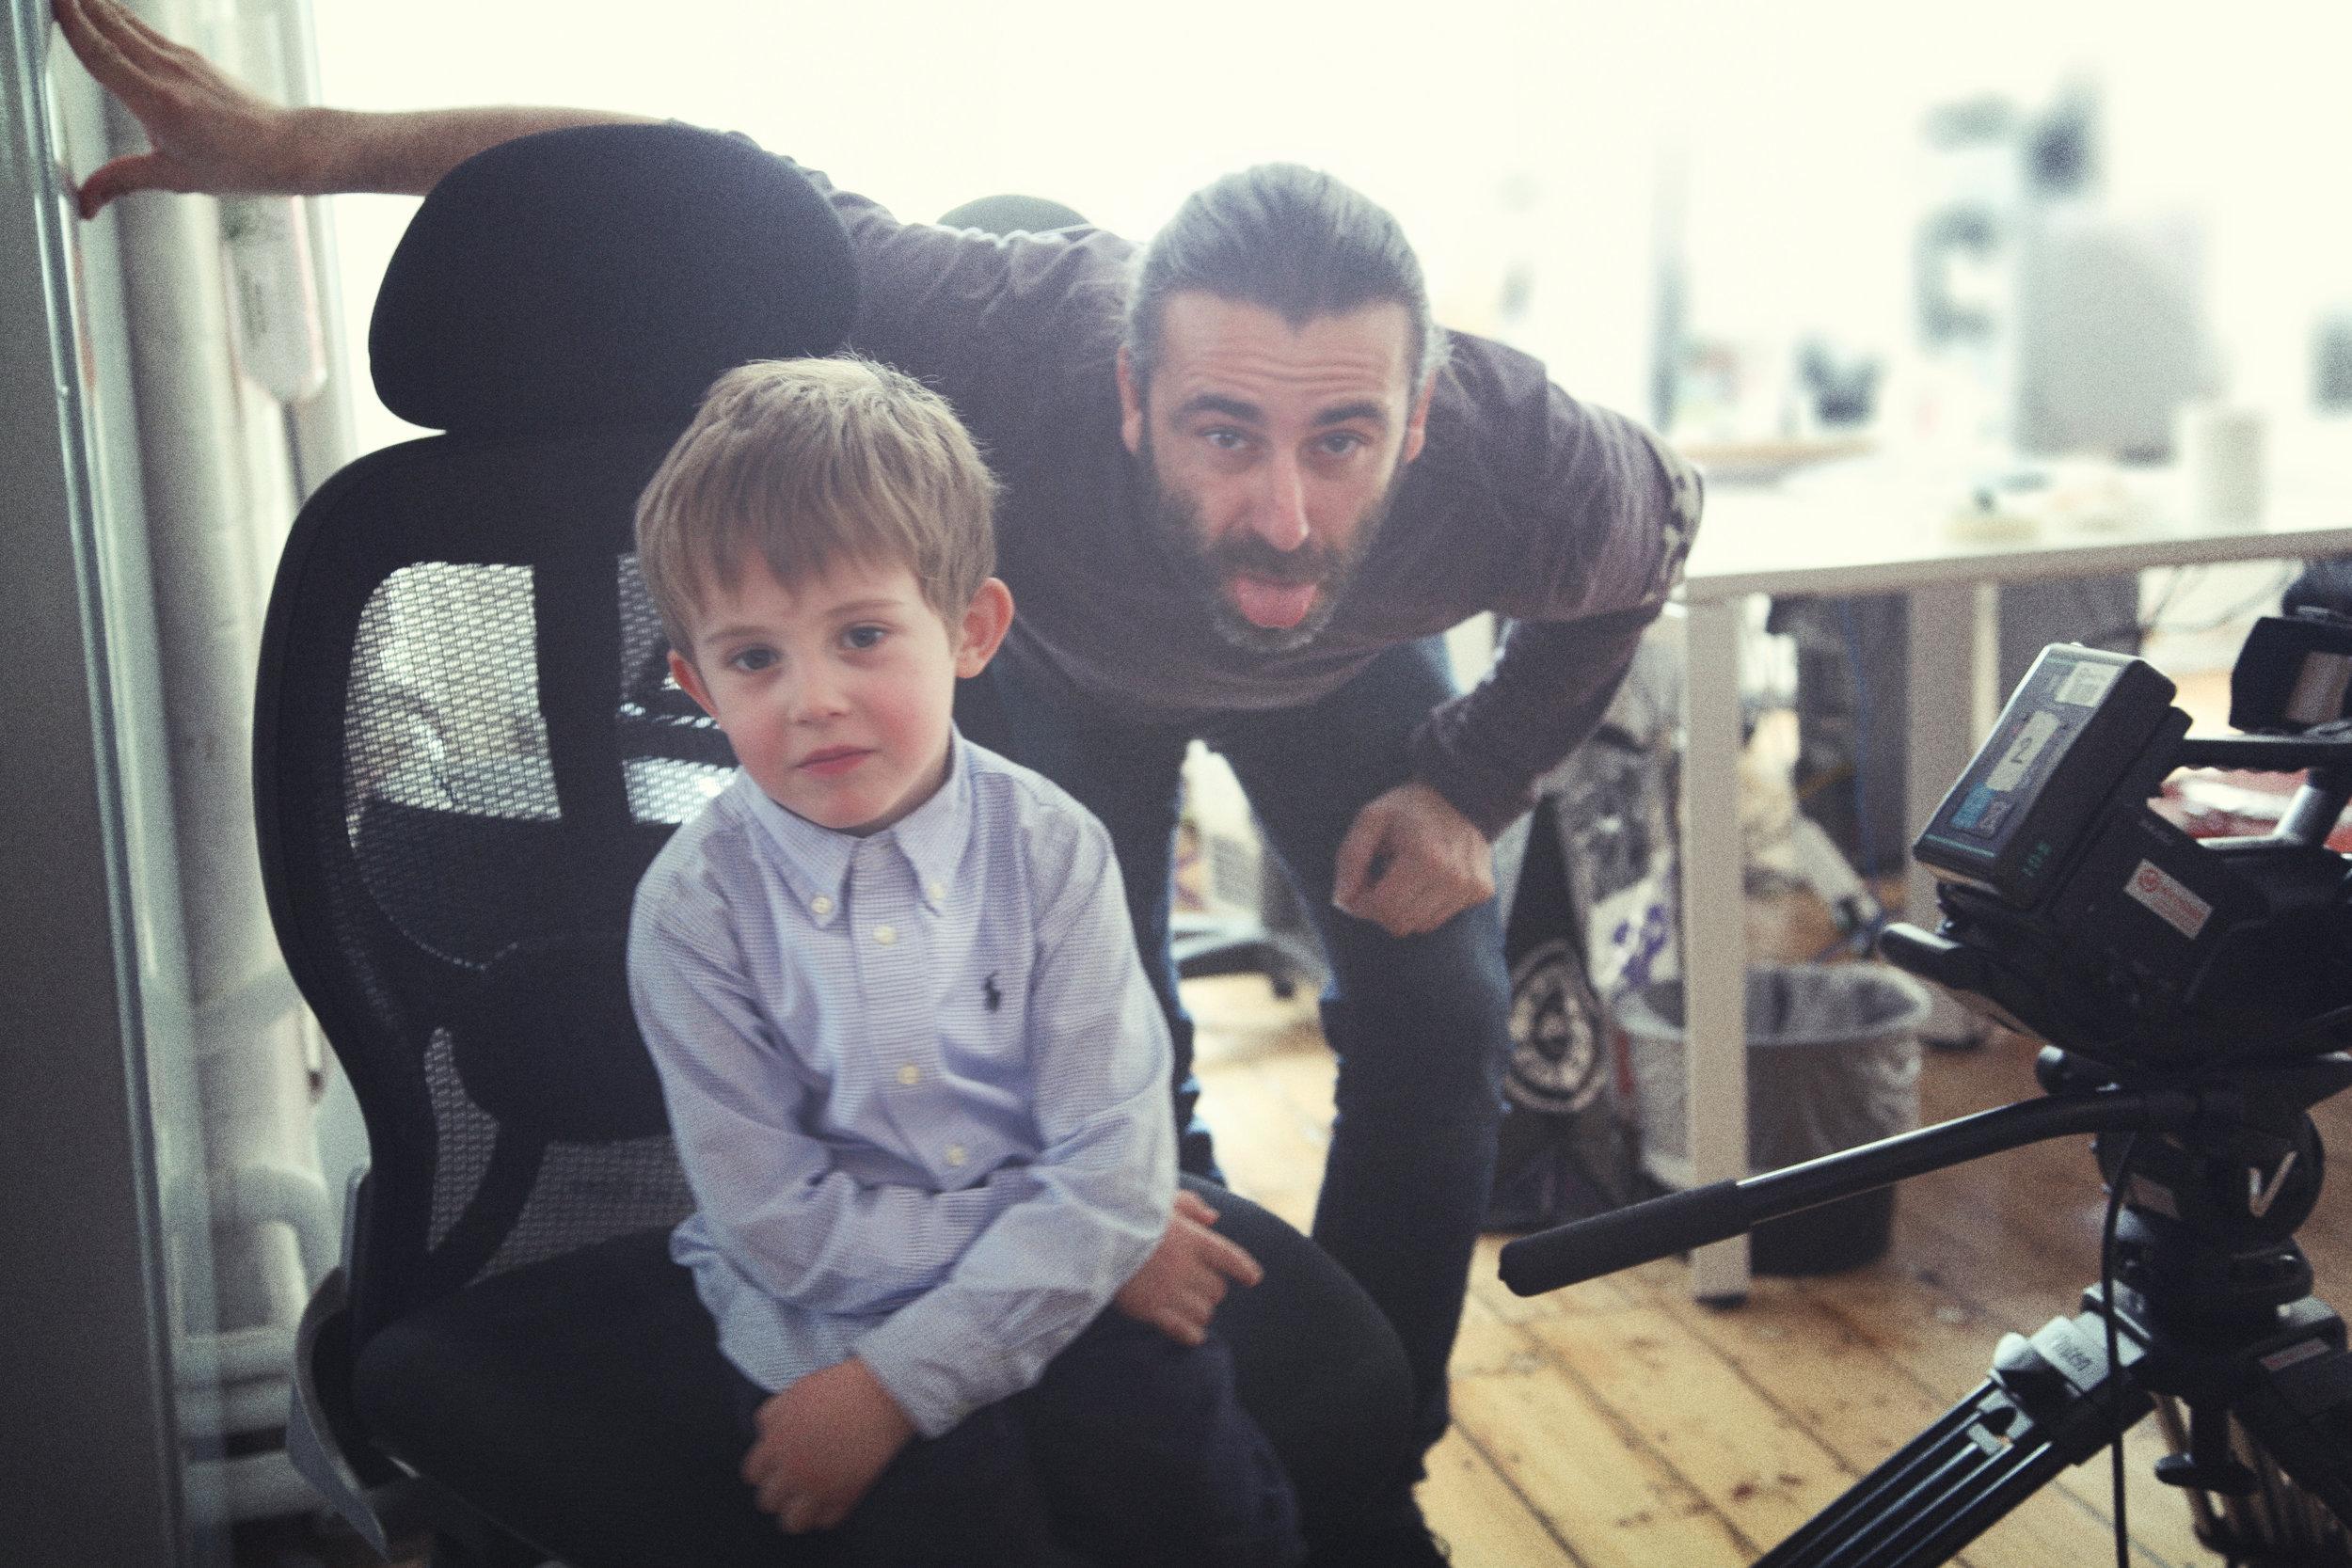 George Tsikos and Riccardo Gagliardi on set at Passion Pictures  (Photo: Greta Invernizzi)